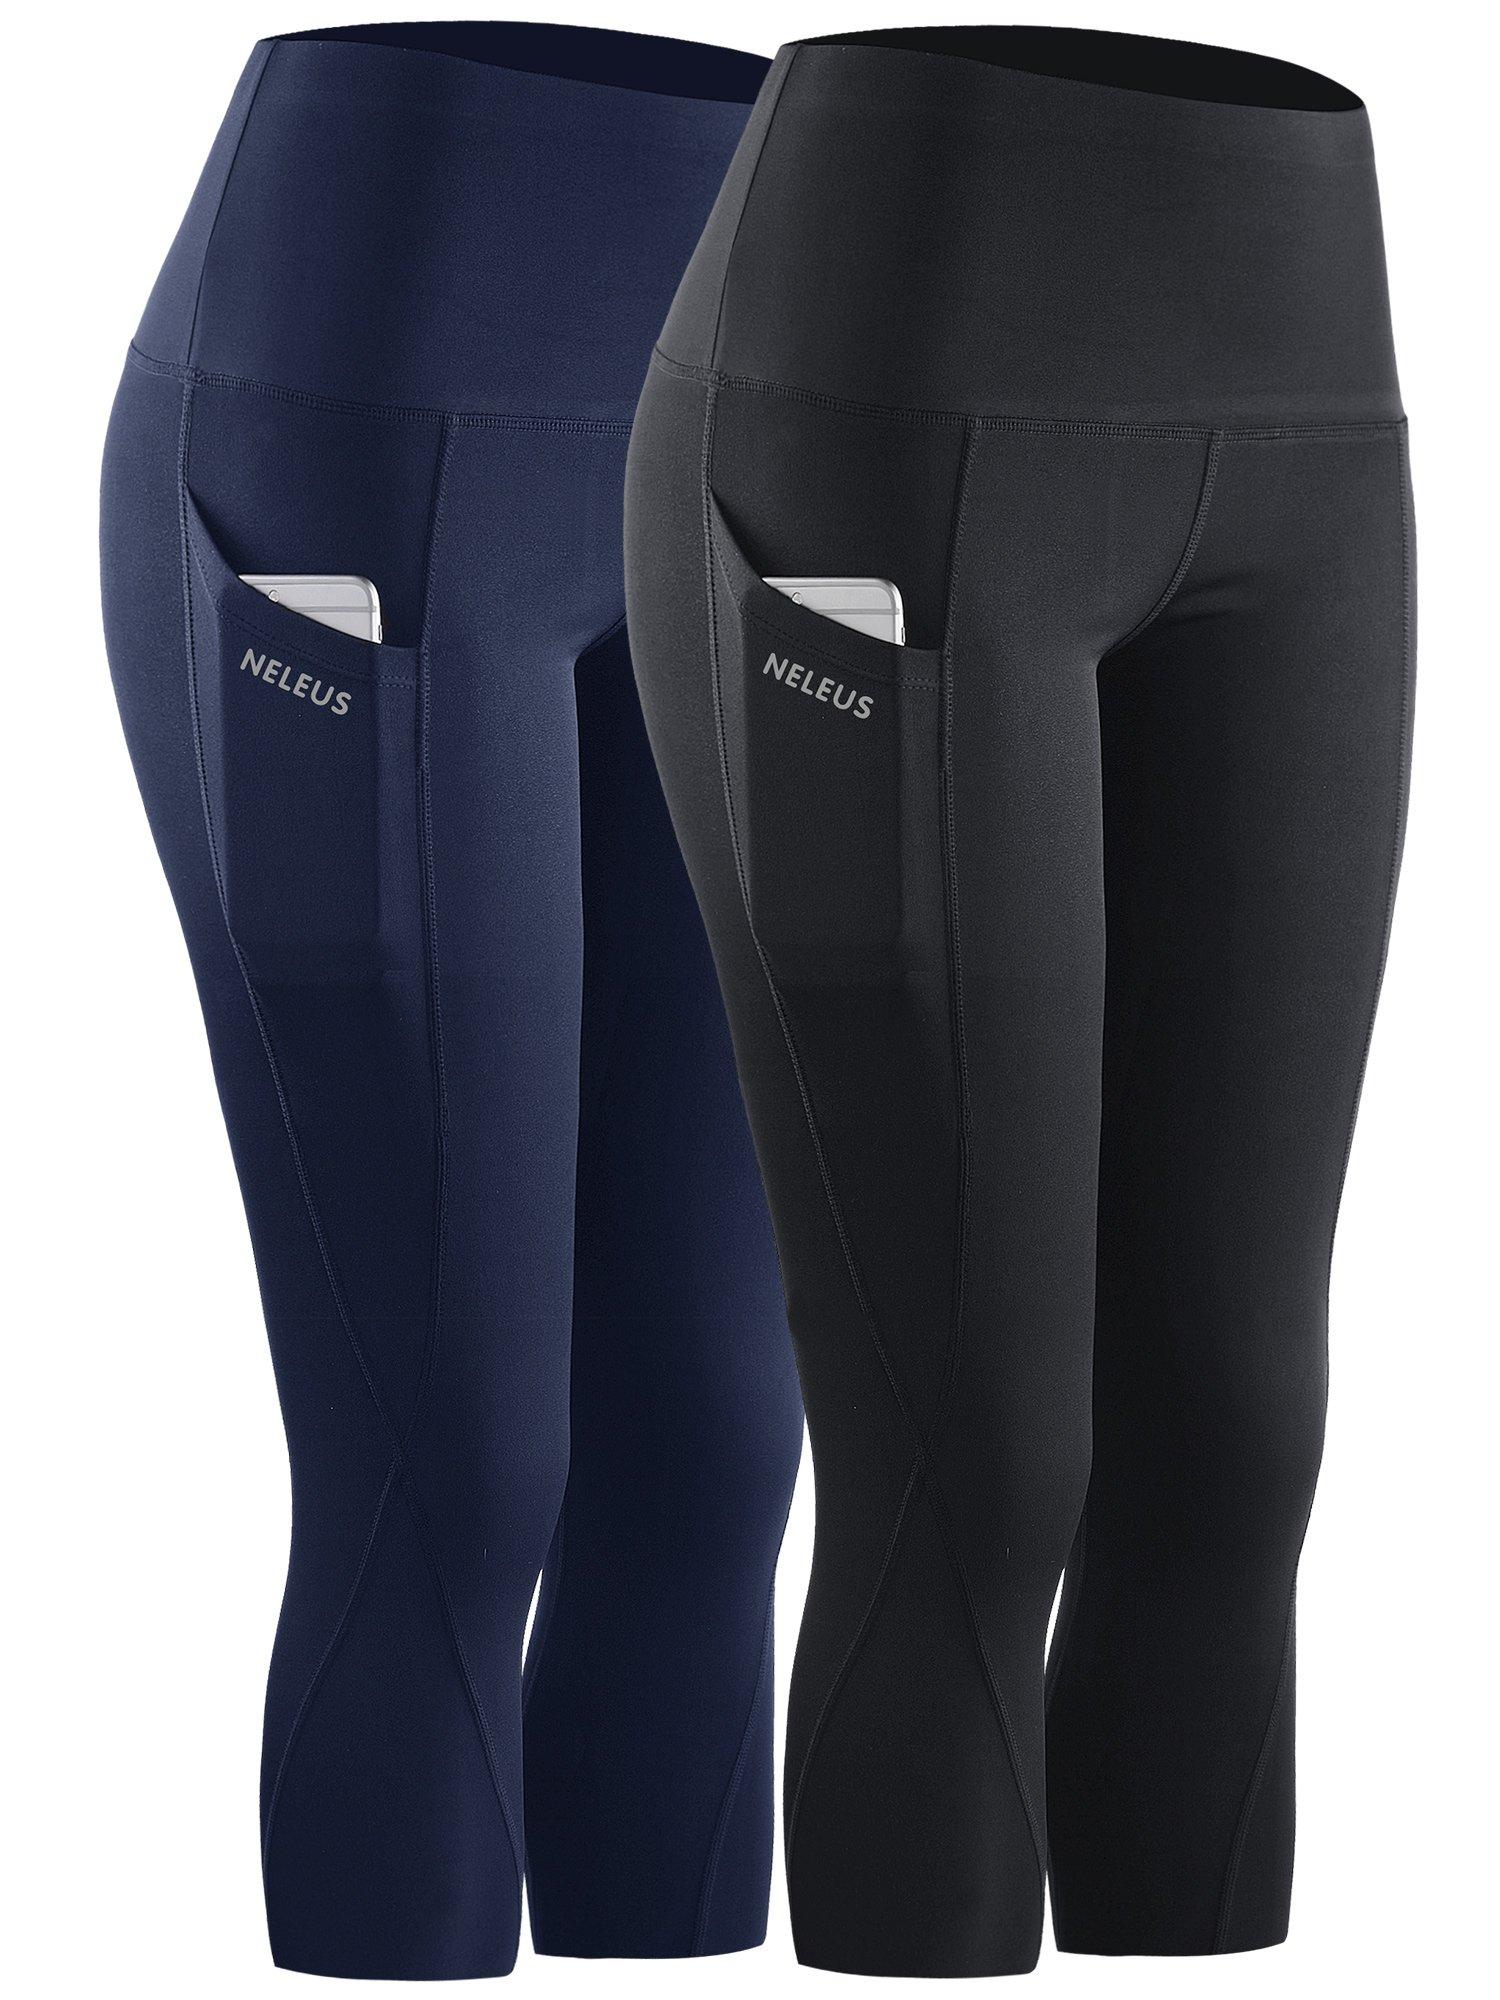 Neleus 2 Pack Tummy Control High Waist Workout Yoga Capri Leggings,9027,Black,Navy Blue,S,EU M